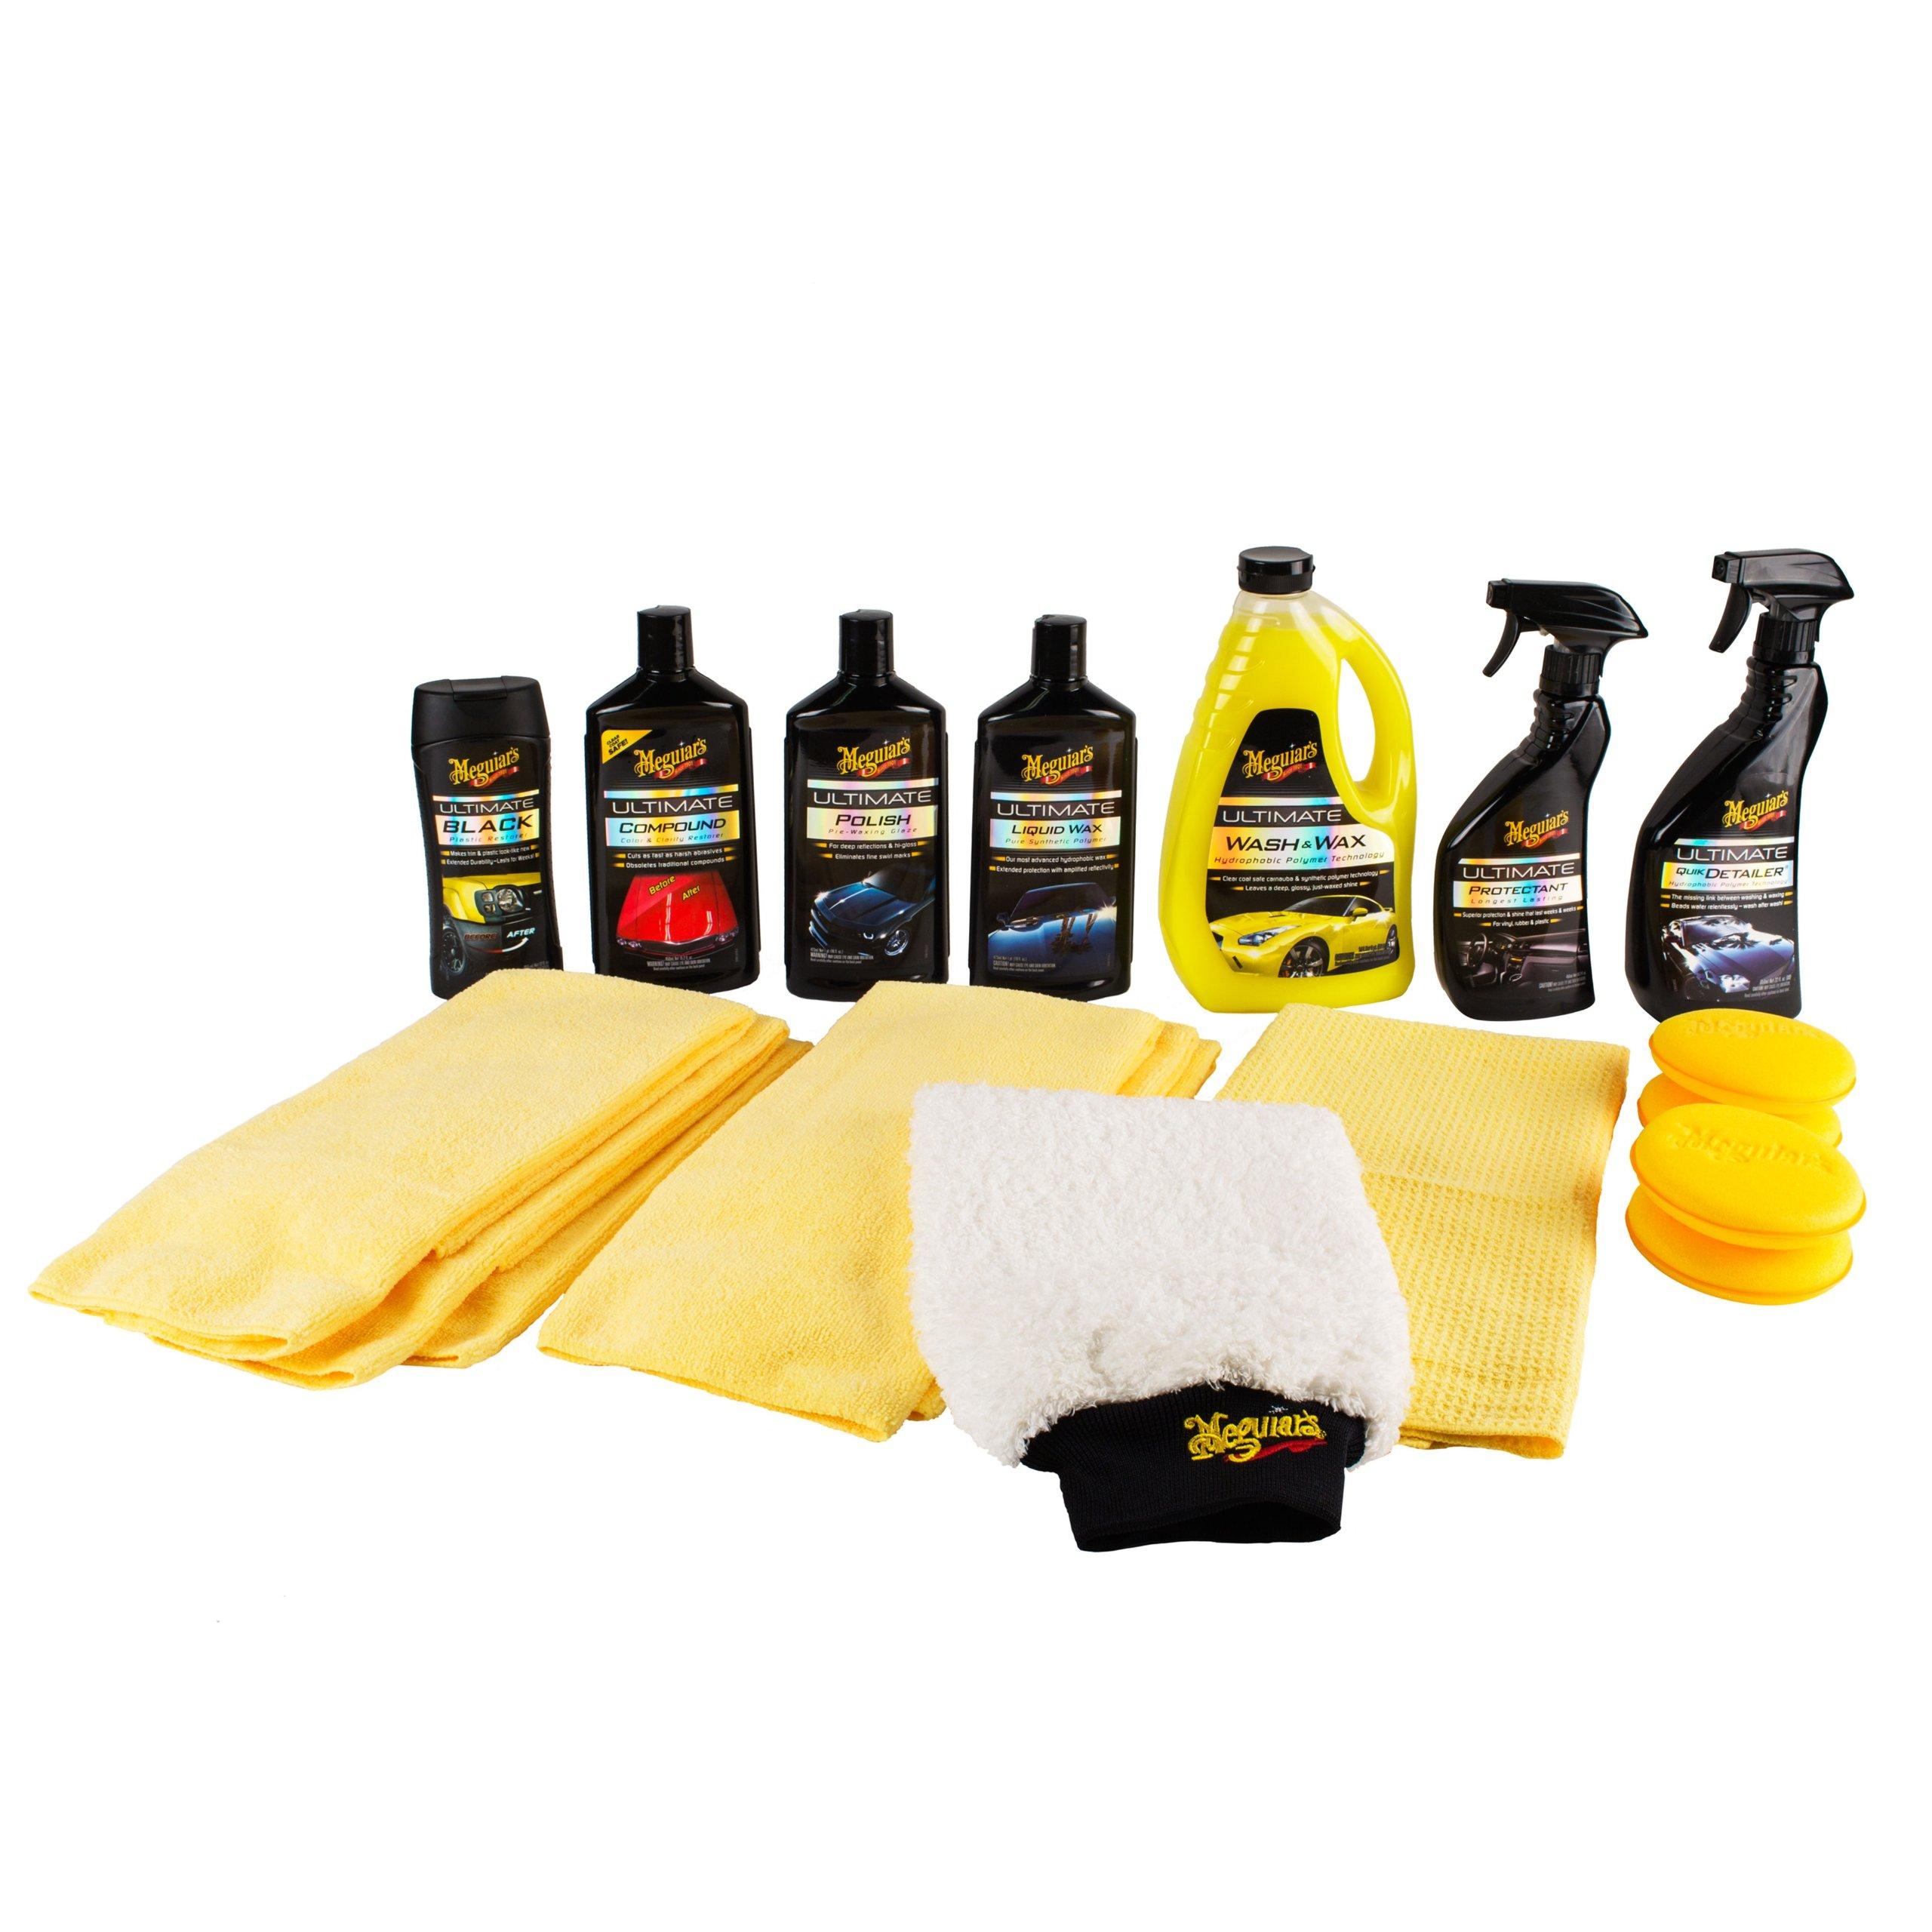 Car Wash Kit >> Meguiar's G55048 Ultimate Car Care Kit 6391847627975 | eBay